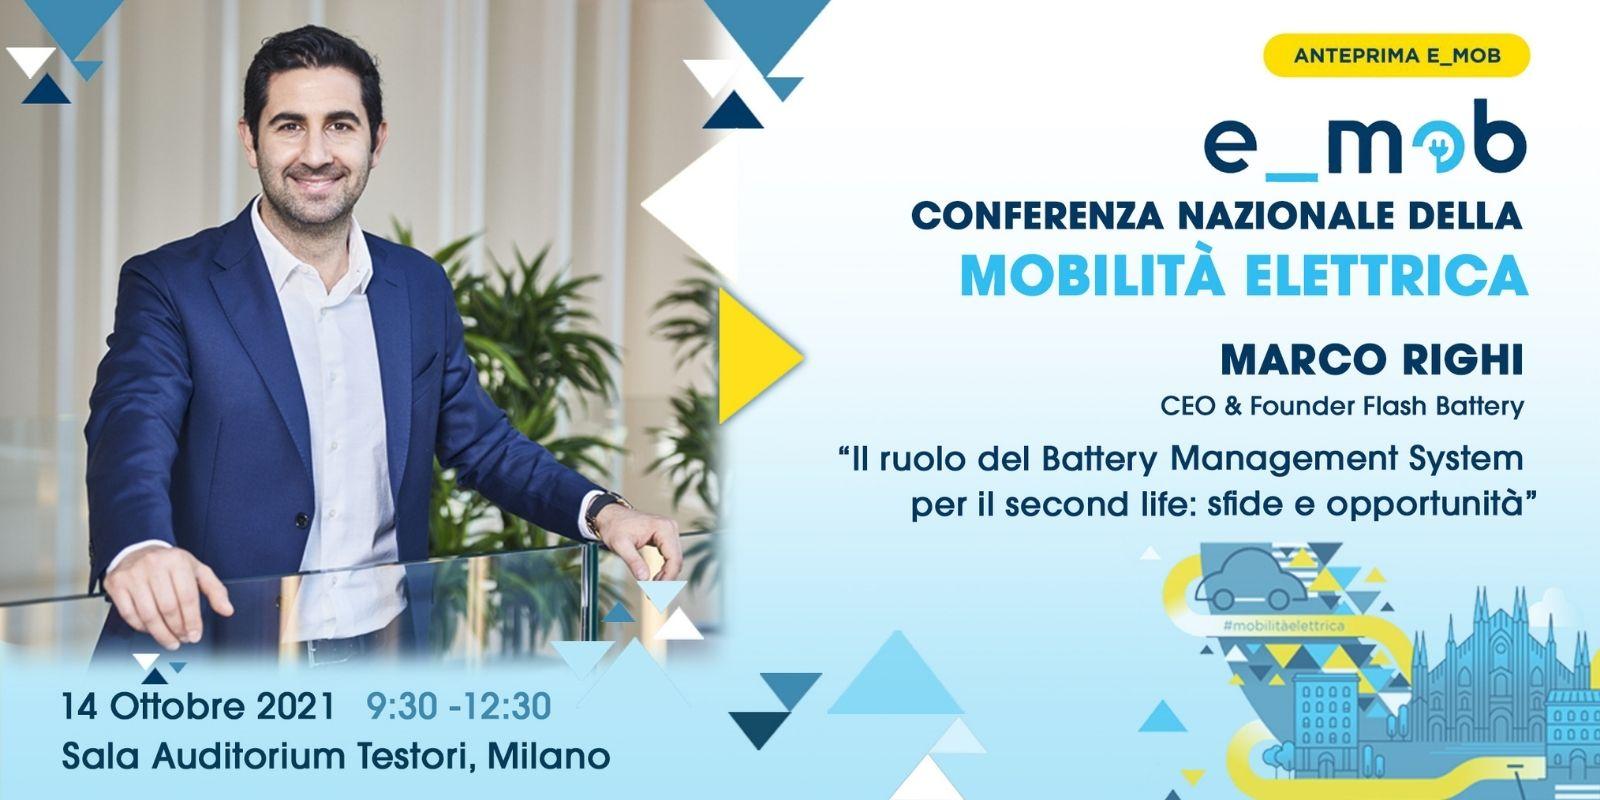 conference E-mob deuxieme vie Marco Righi